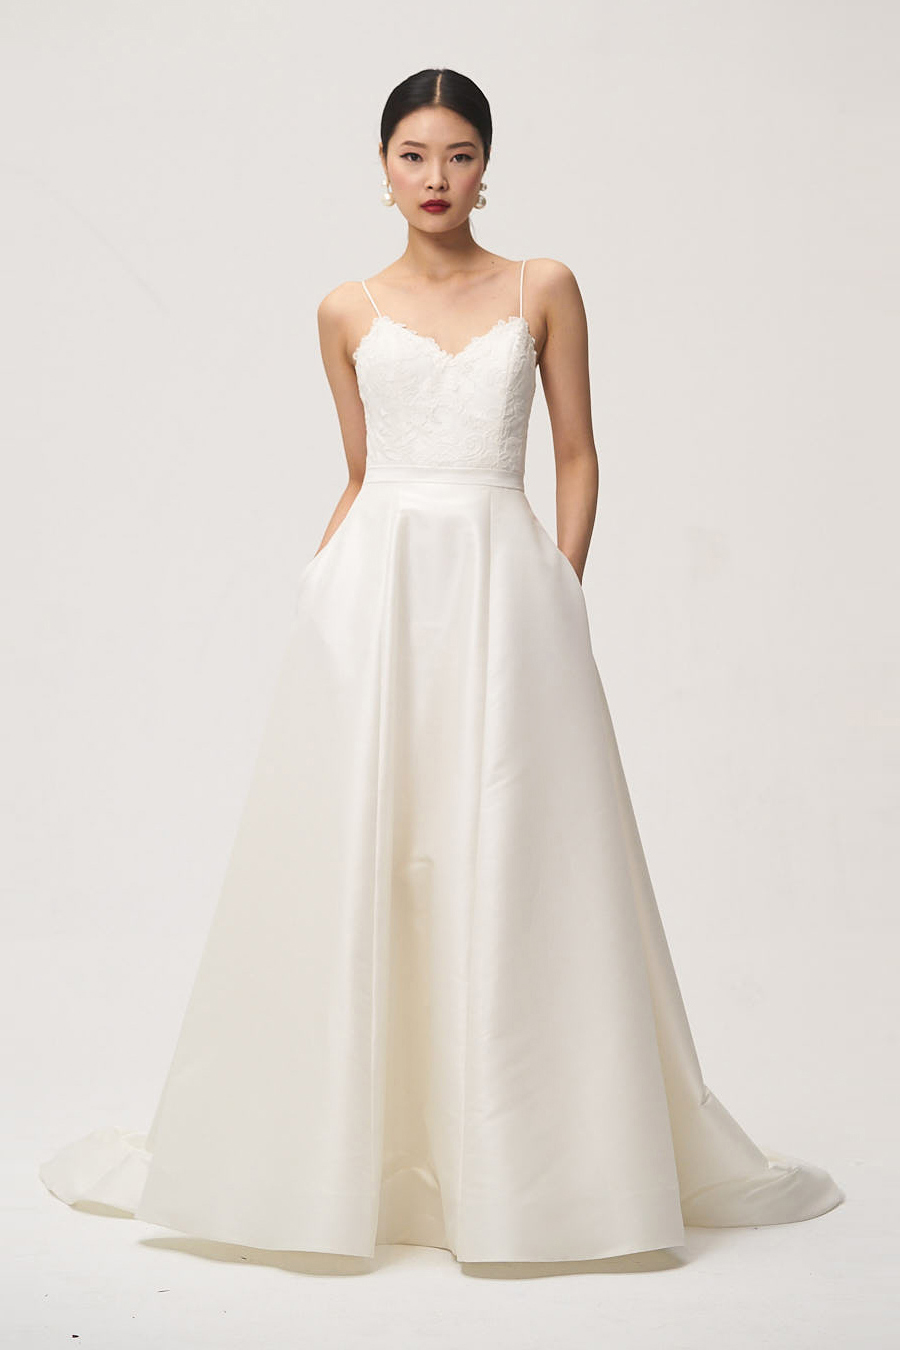 jenny by jenny yoo fall 2018 spaghetti strap lace top wedding dress